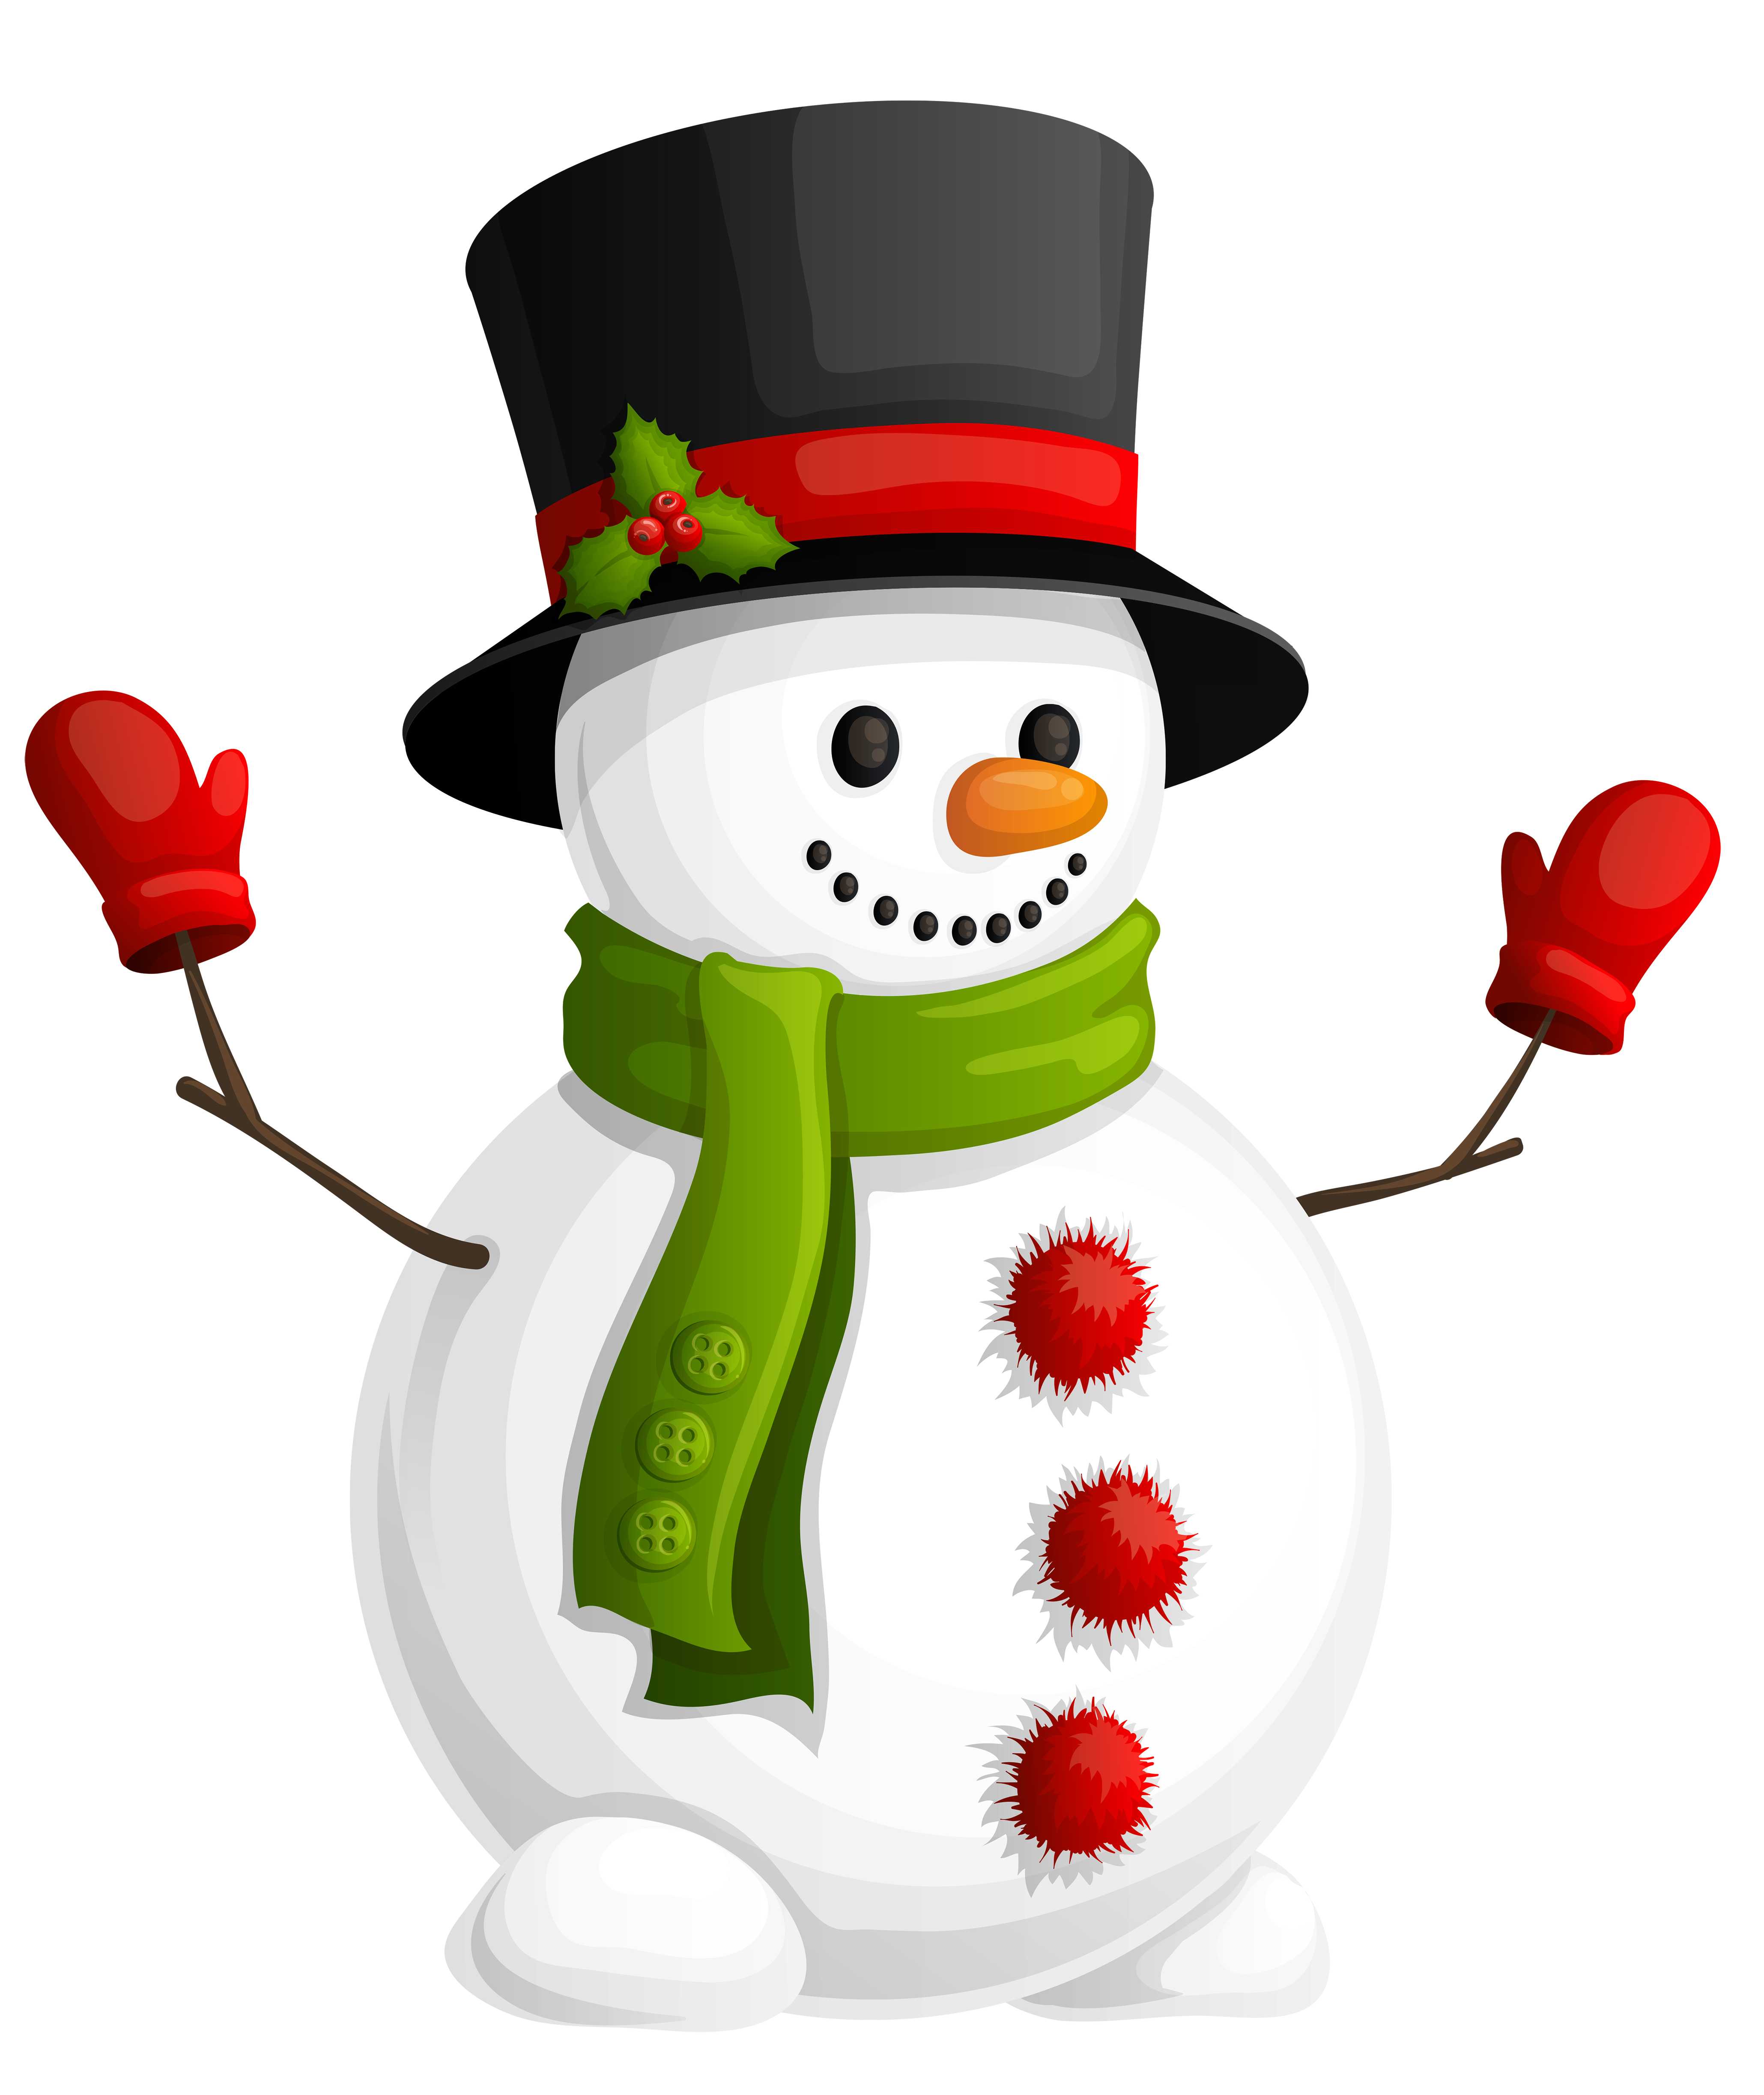 Snowman clipart green. Christmas ornament decoration